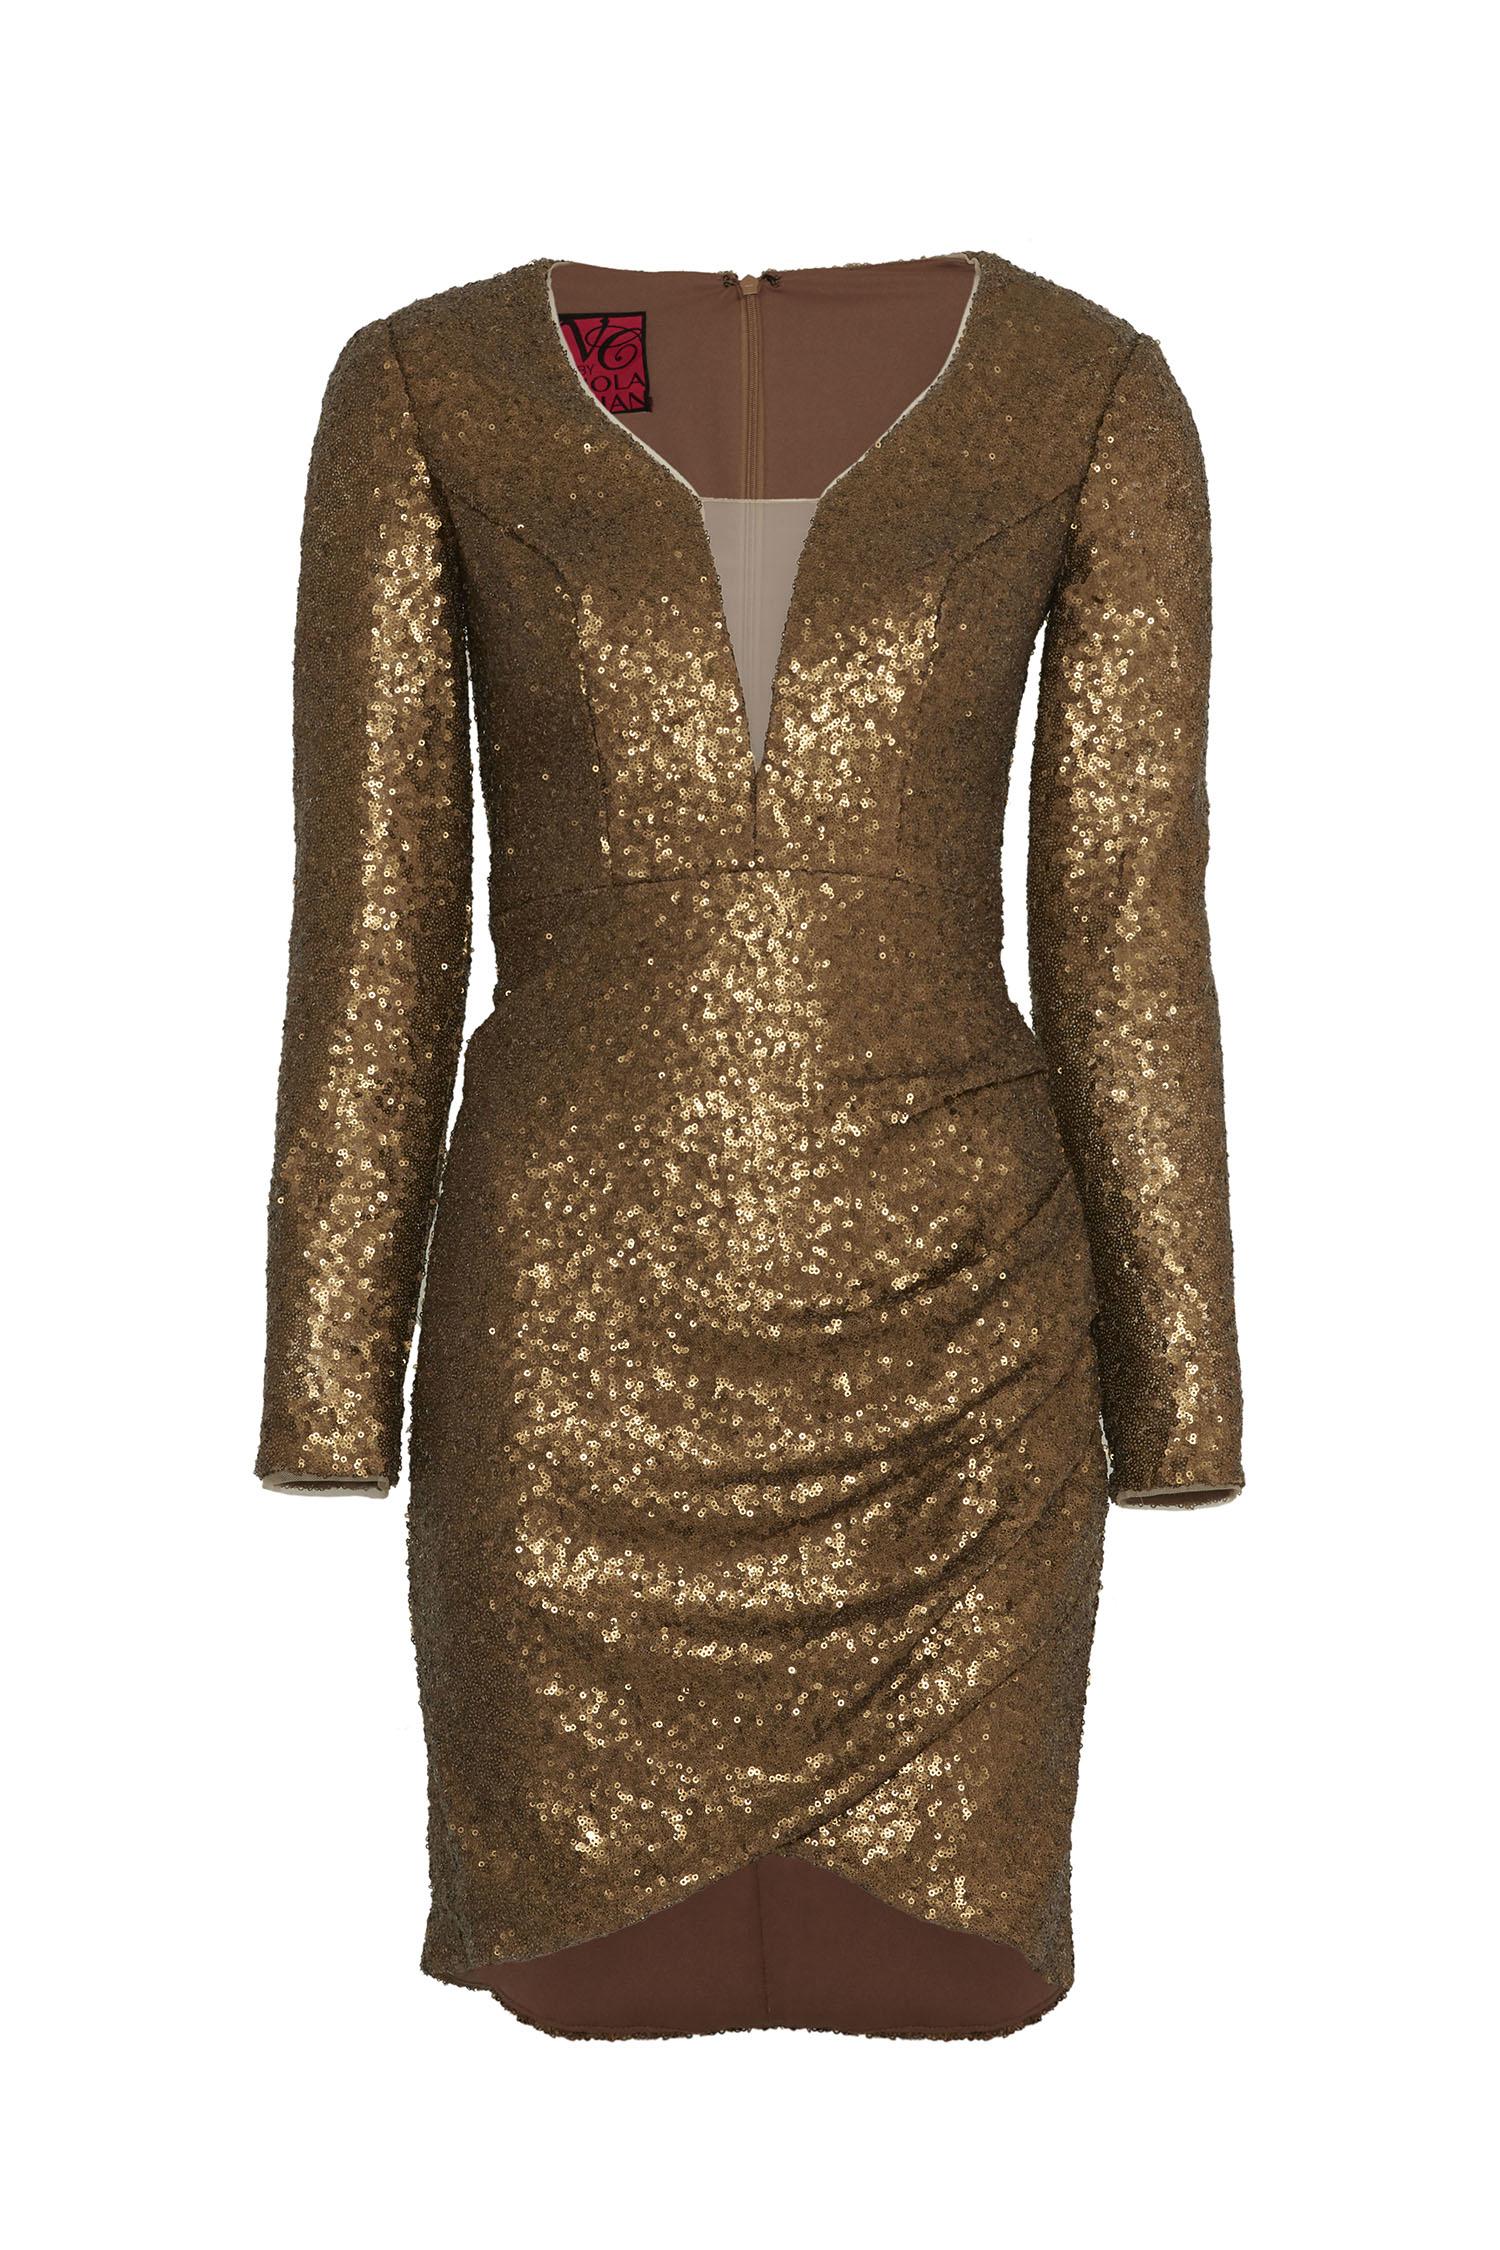 Gold Rengi İllüzyon V Yaka Uzun Kollu Payetli Dar Mini Abiye - Thumbnail